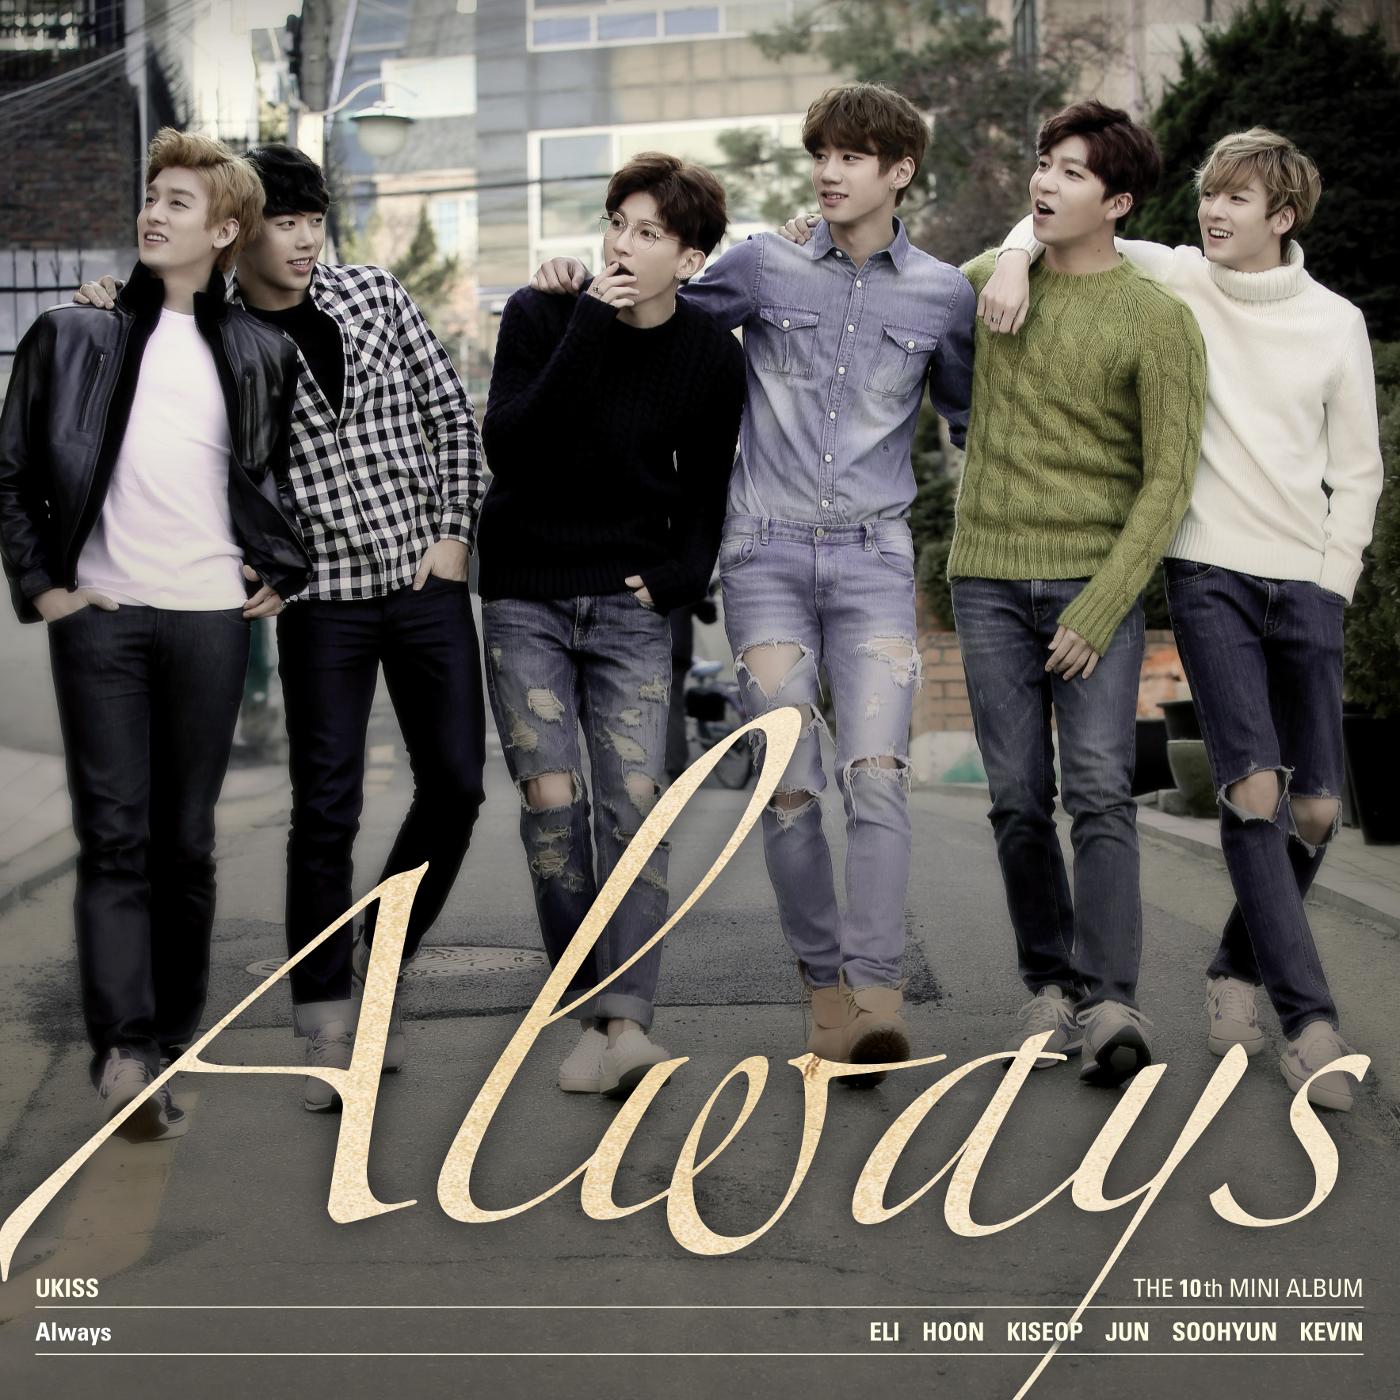 Always (U-KISS)